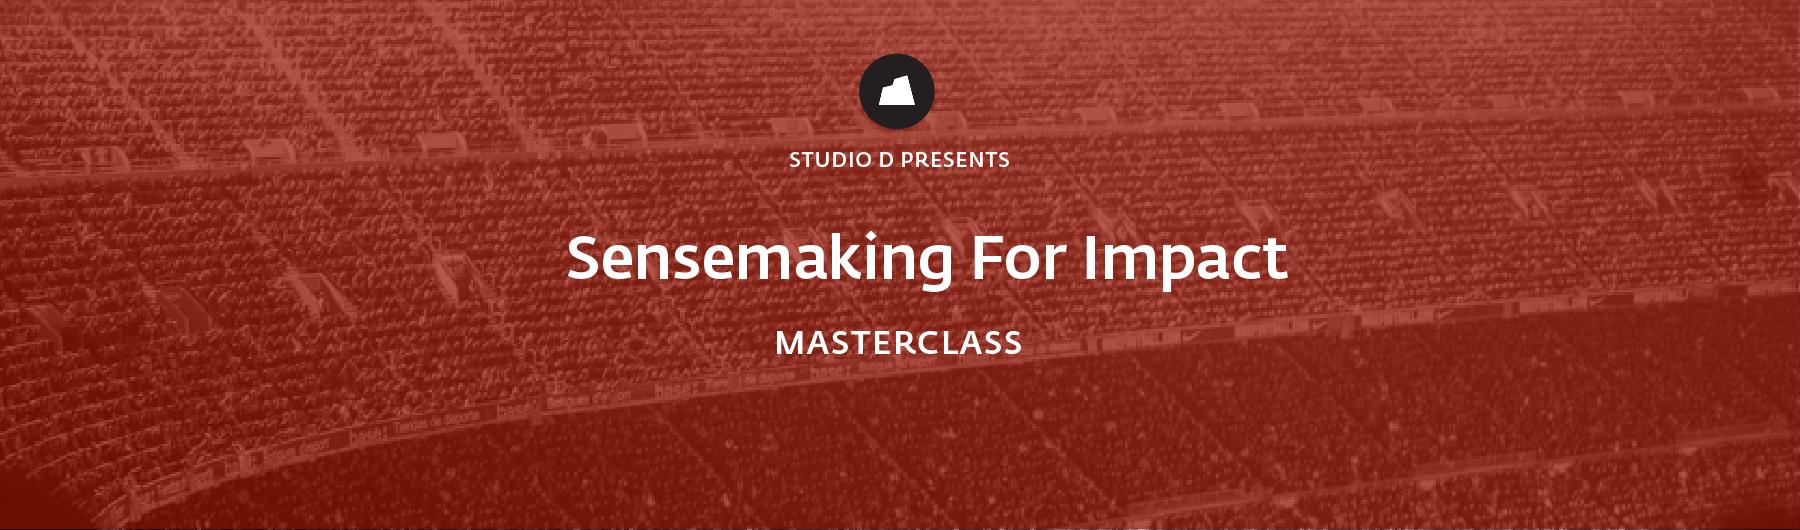 Sensemaking For Impact Masterclass, 24 March 2020, San Francisco